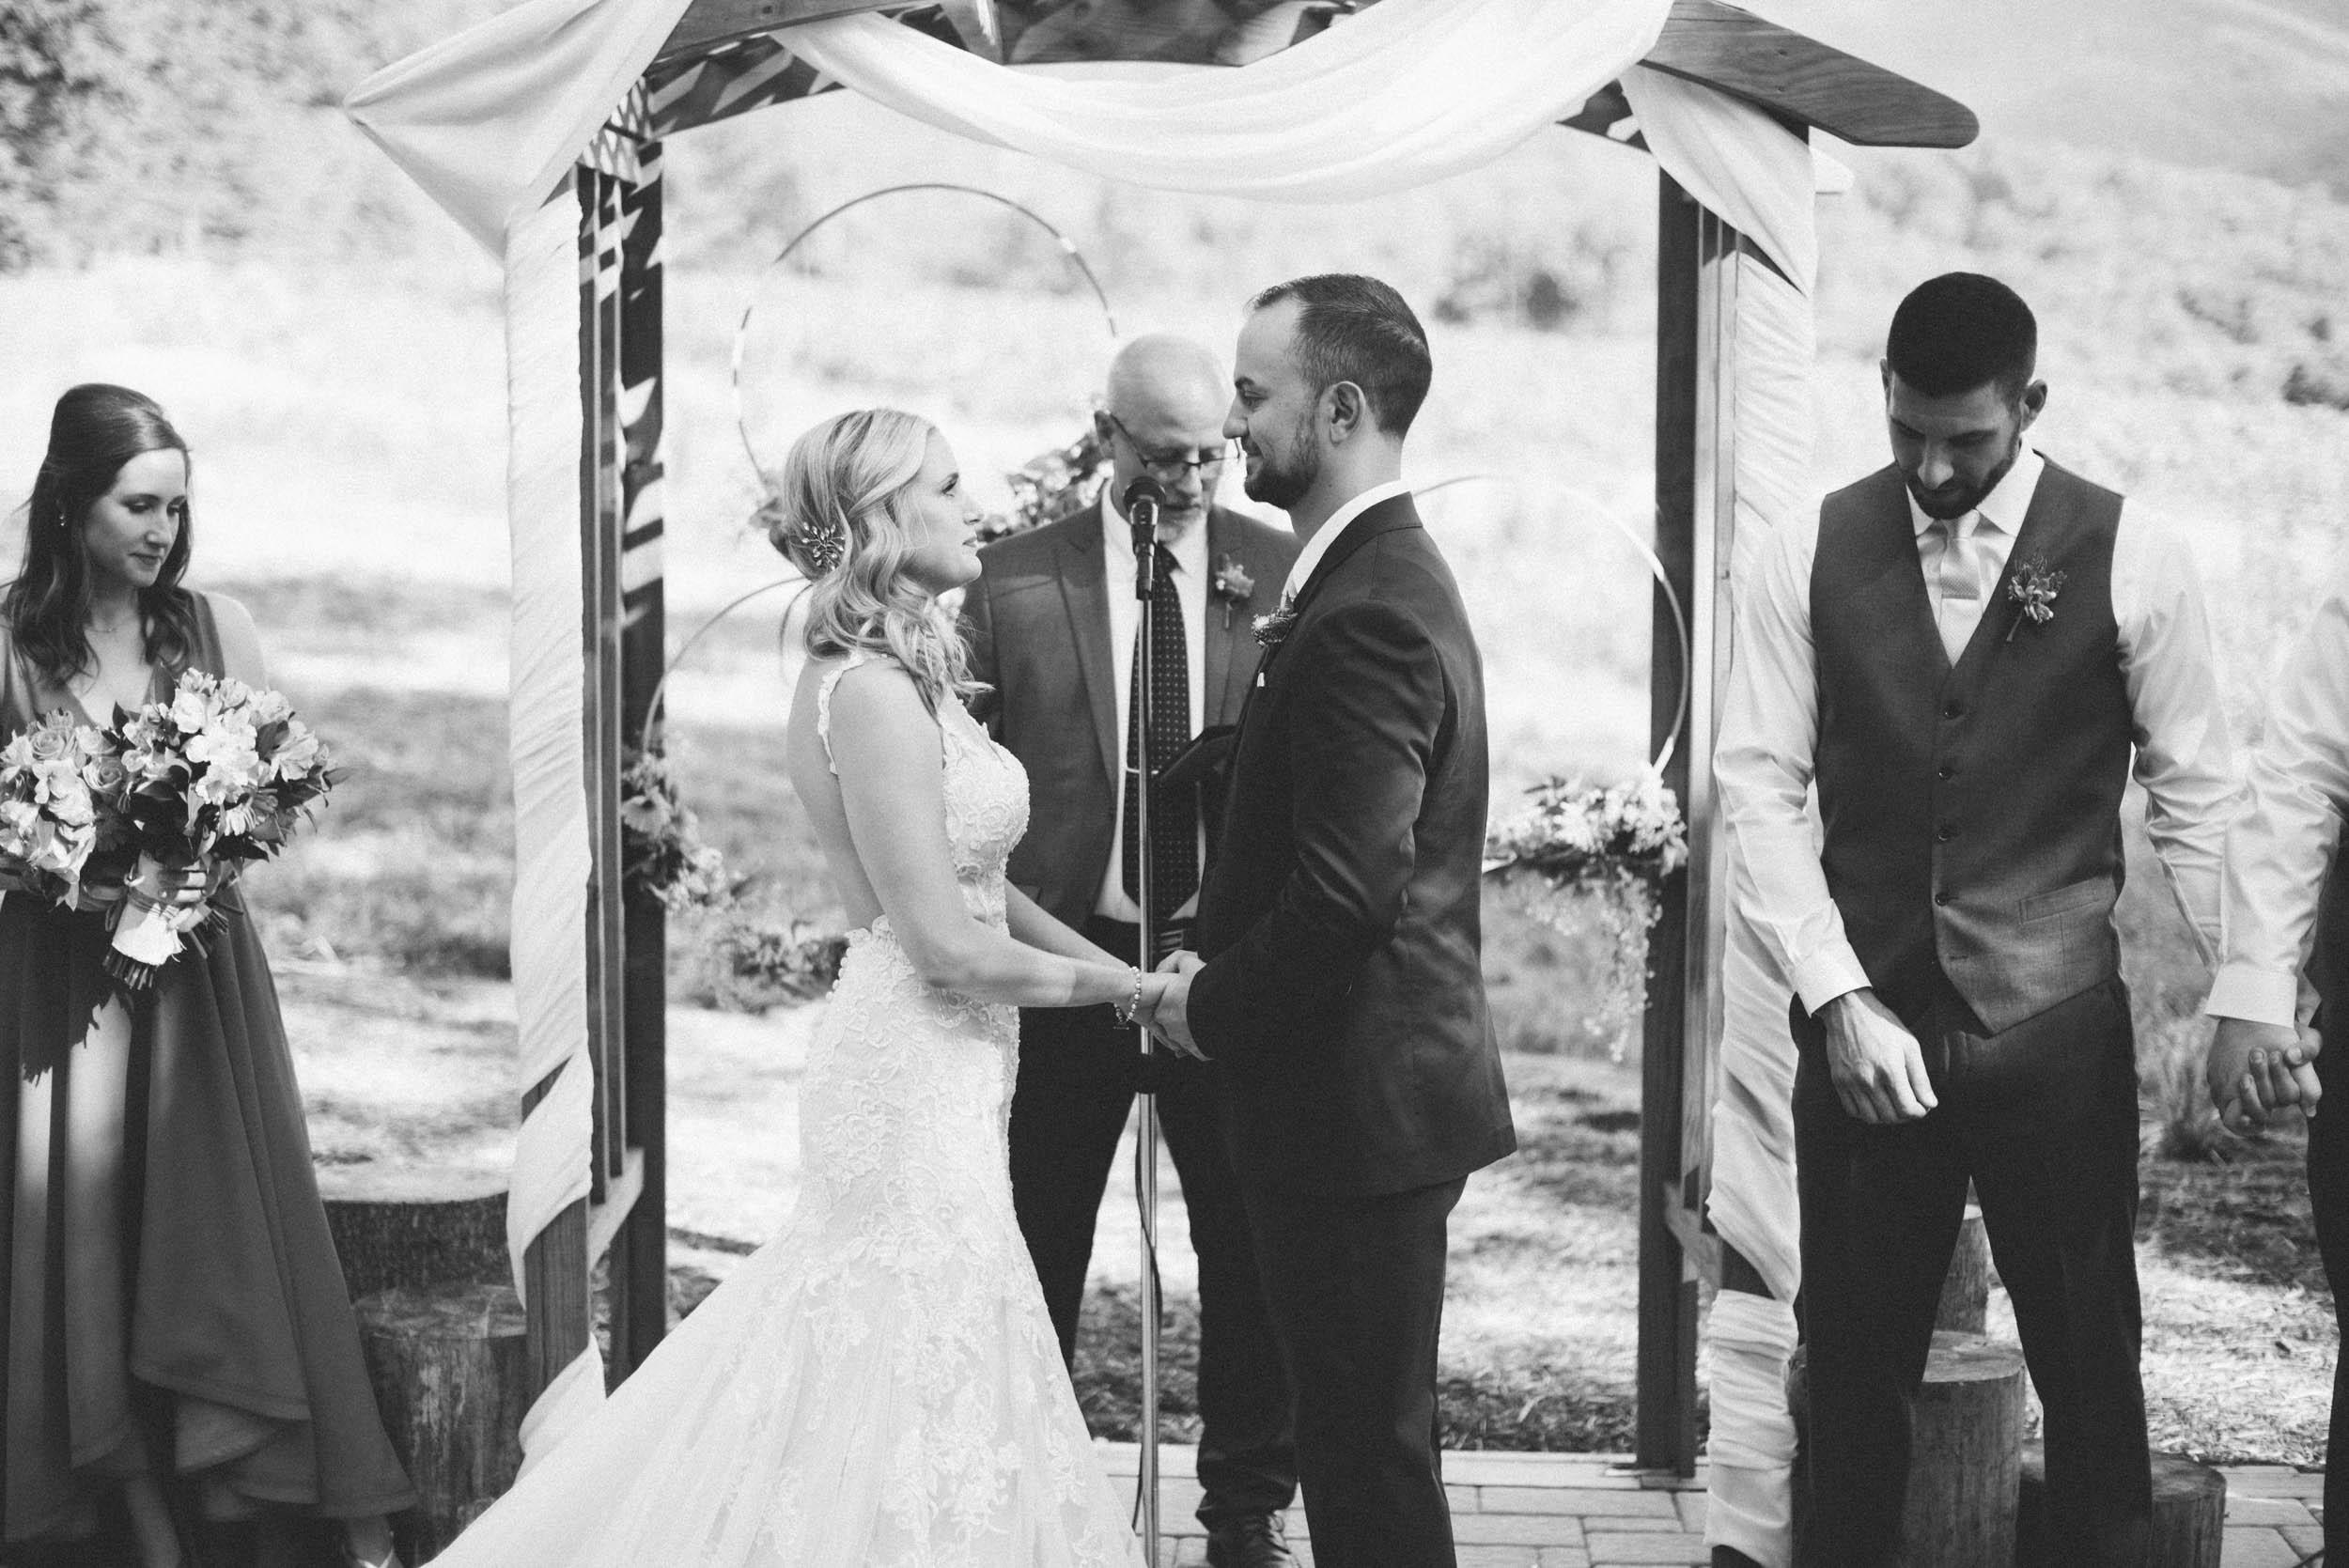 Virginia wedding photojournalist